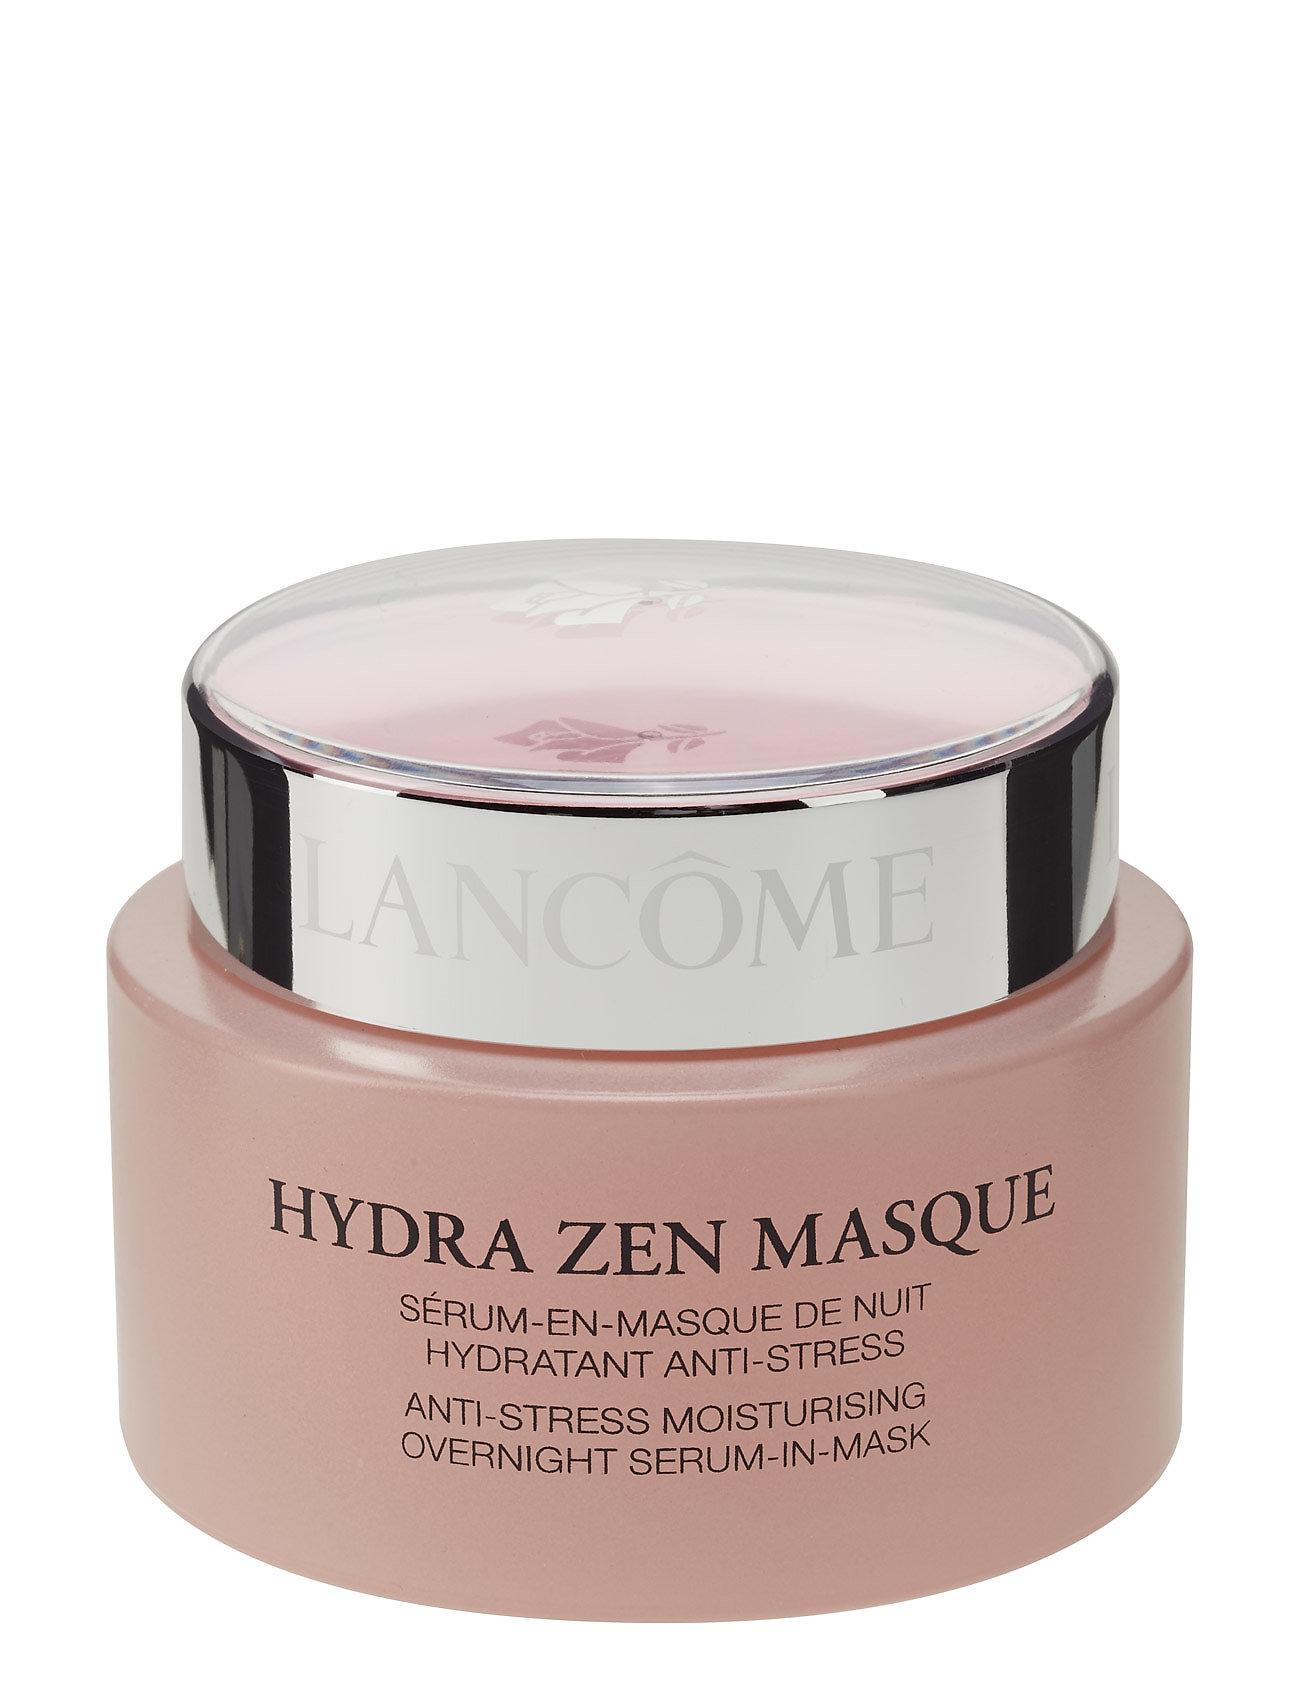 Hydra zen night mask 75 ml fra lancã´me fra boozt.com dk